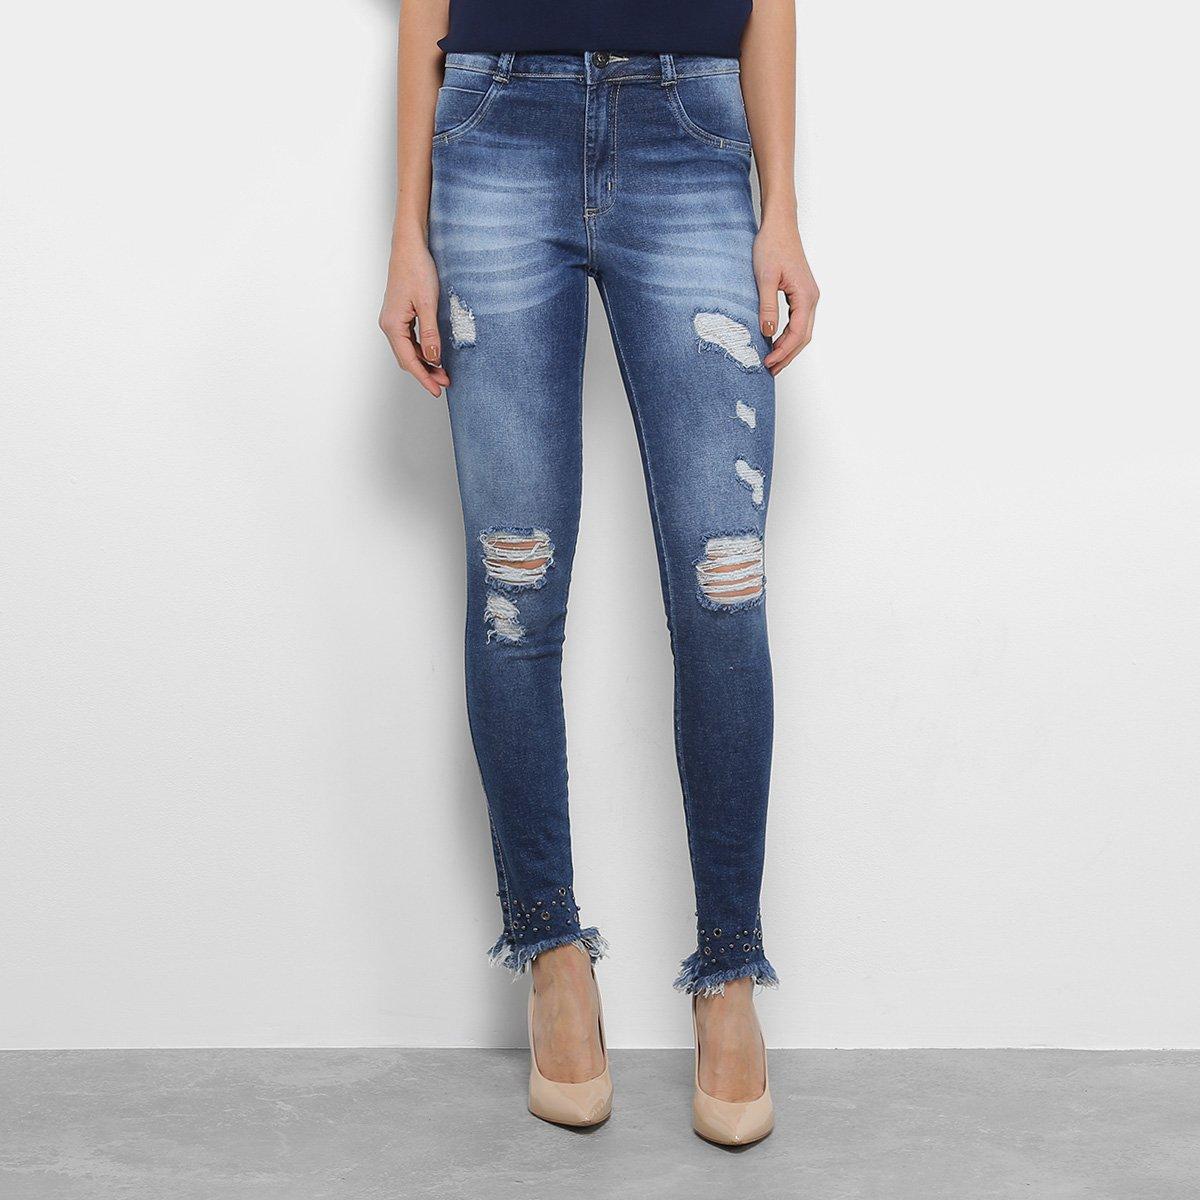 de3d98dbf Calça Jeans Skinny Biotipo Cintura Média Feminina